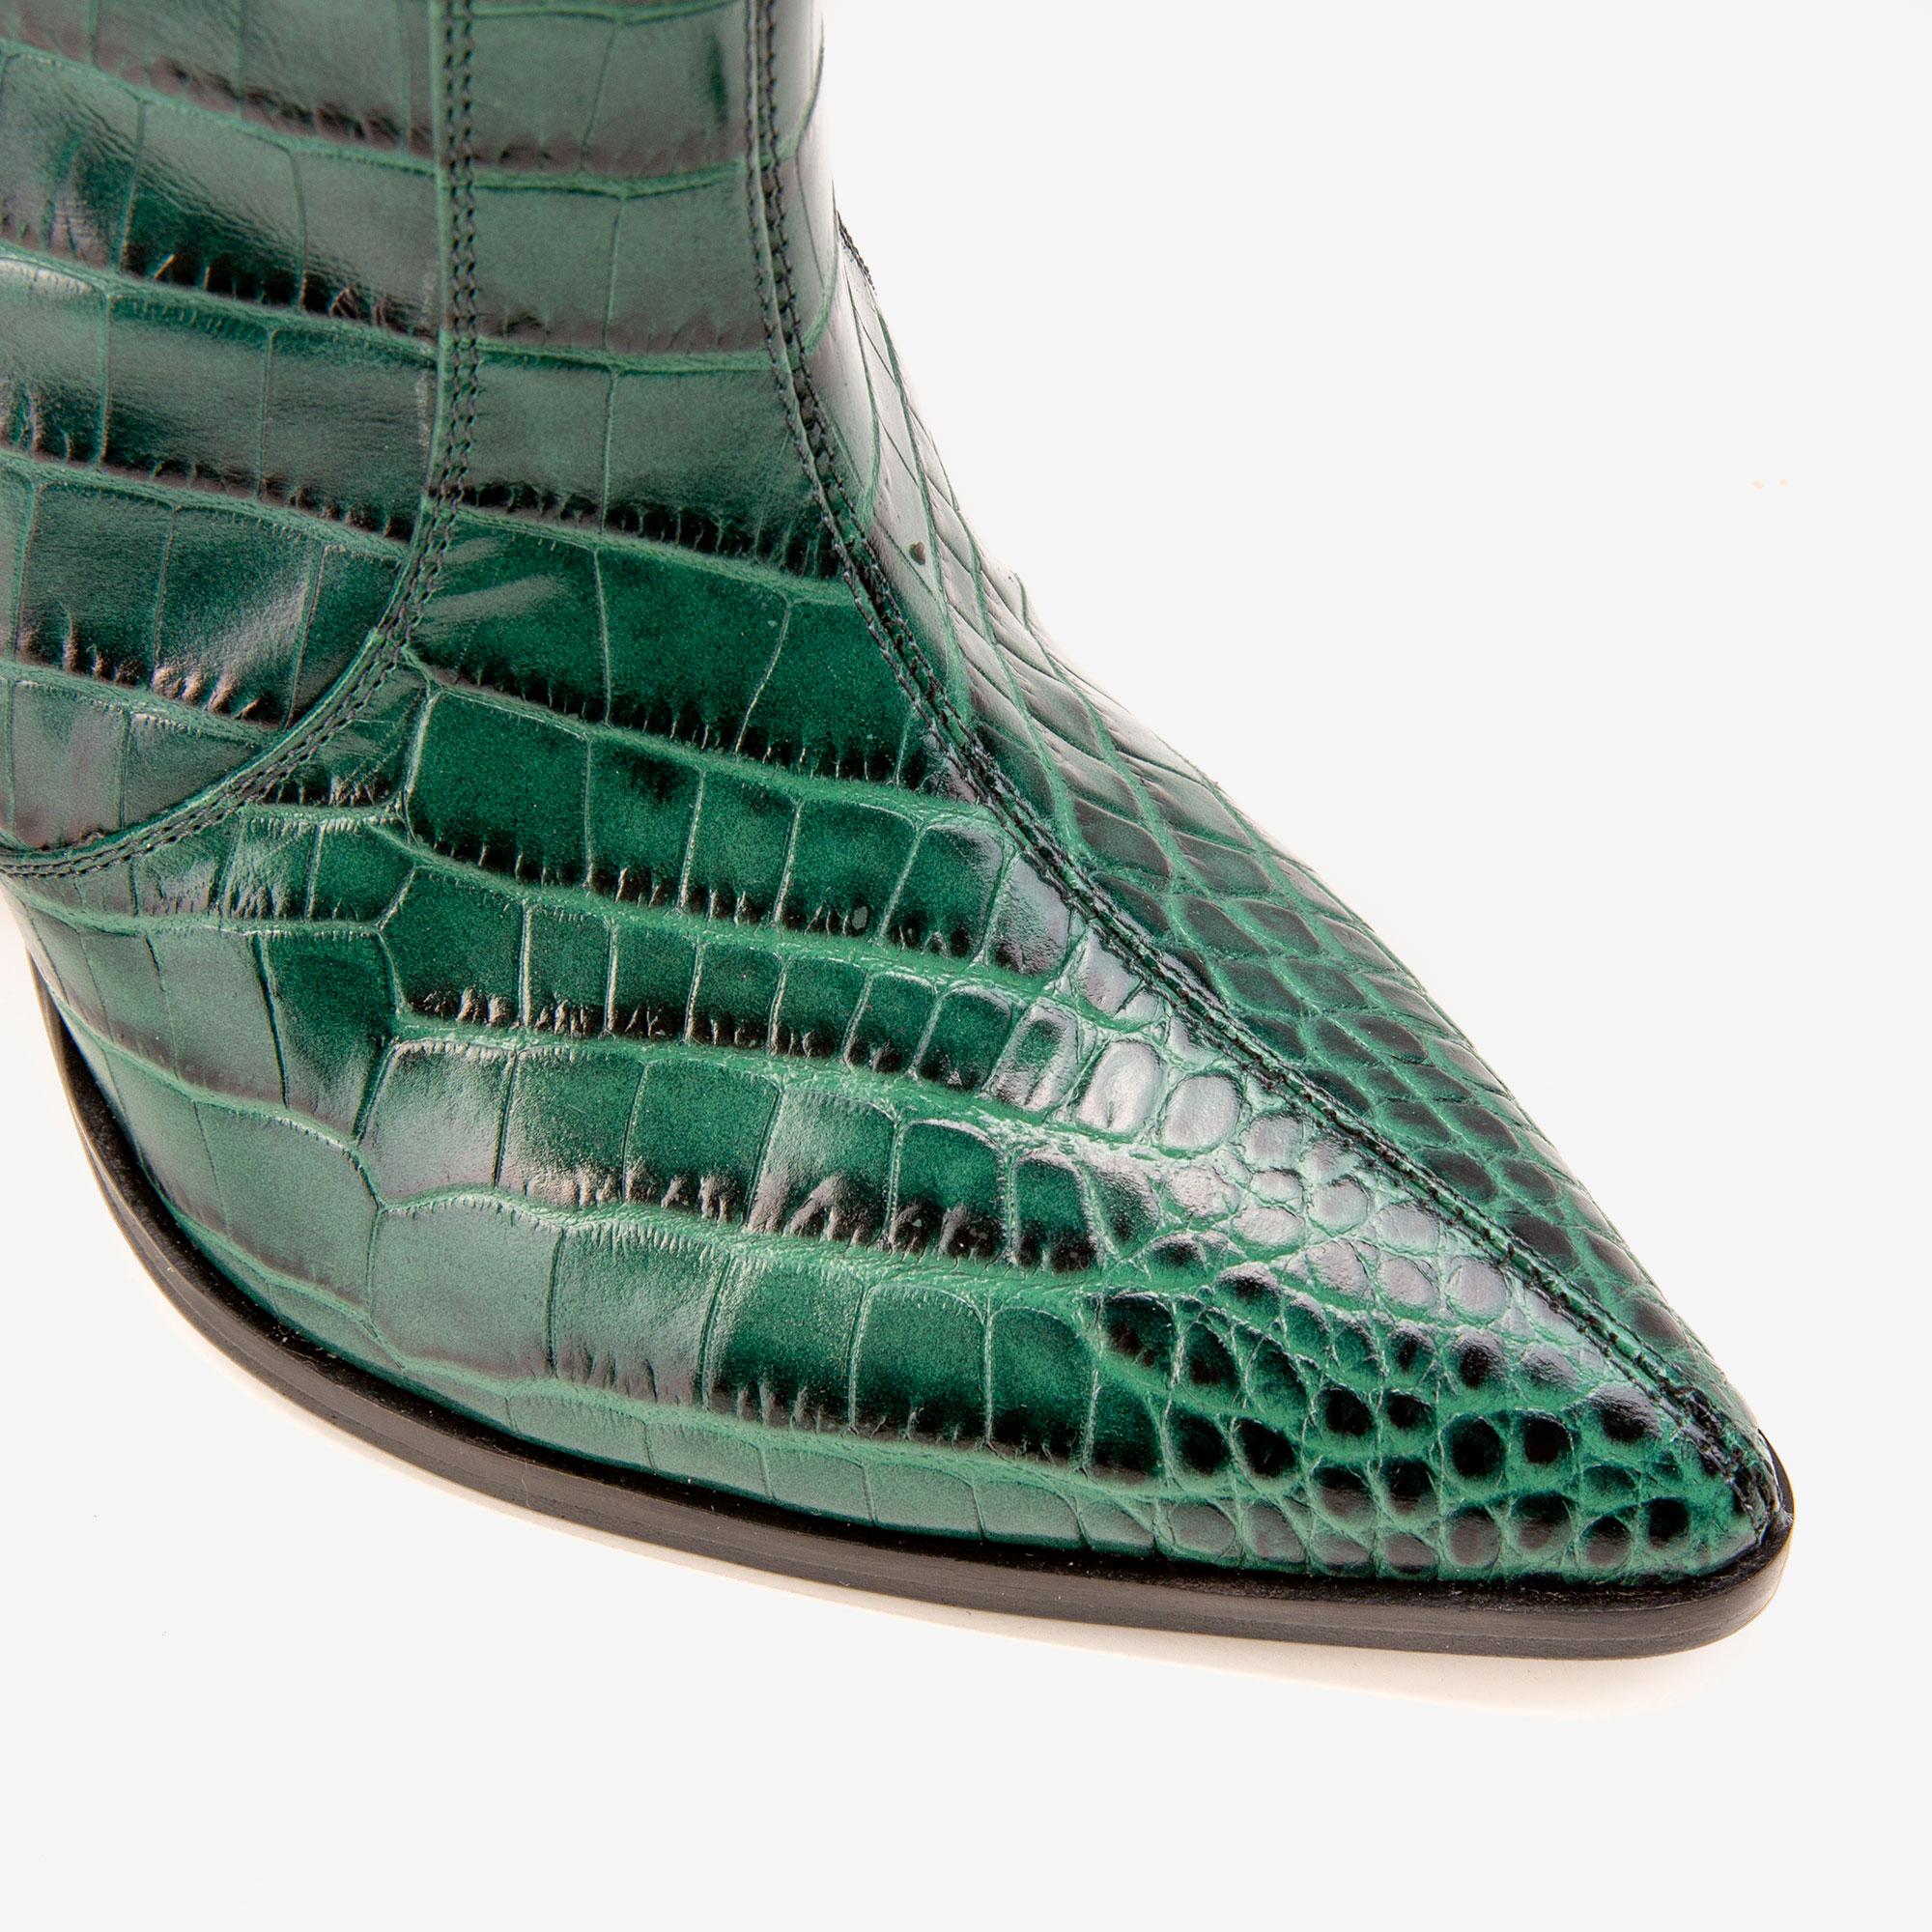 Botine largi din piele verde stantata croco Ginissima imagine 3